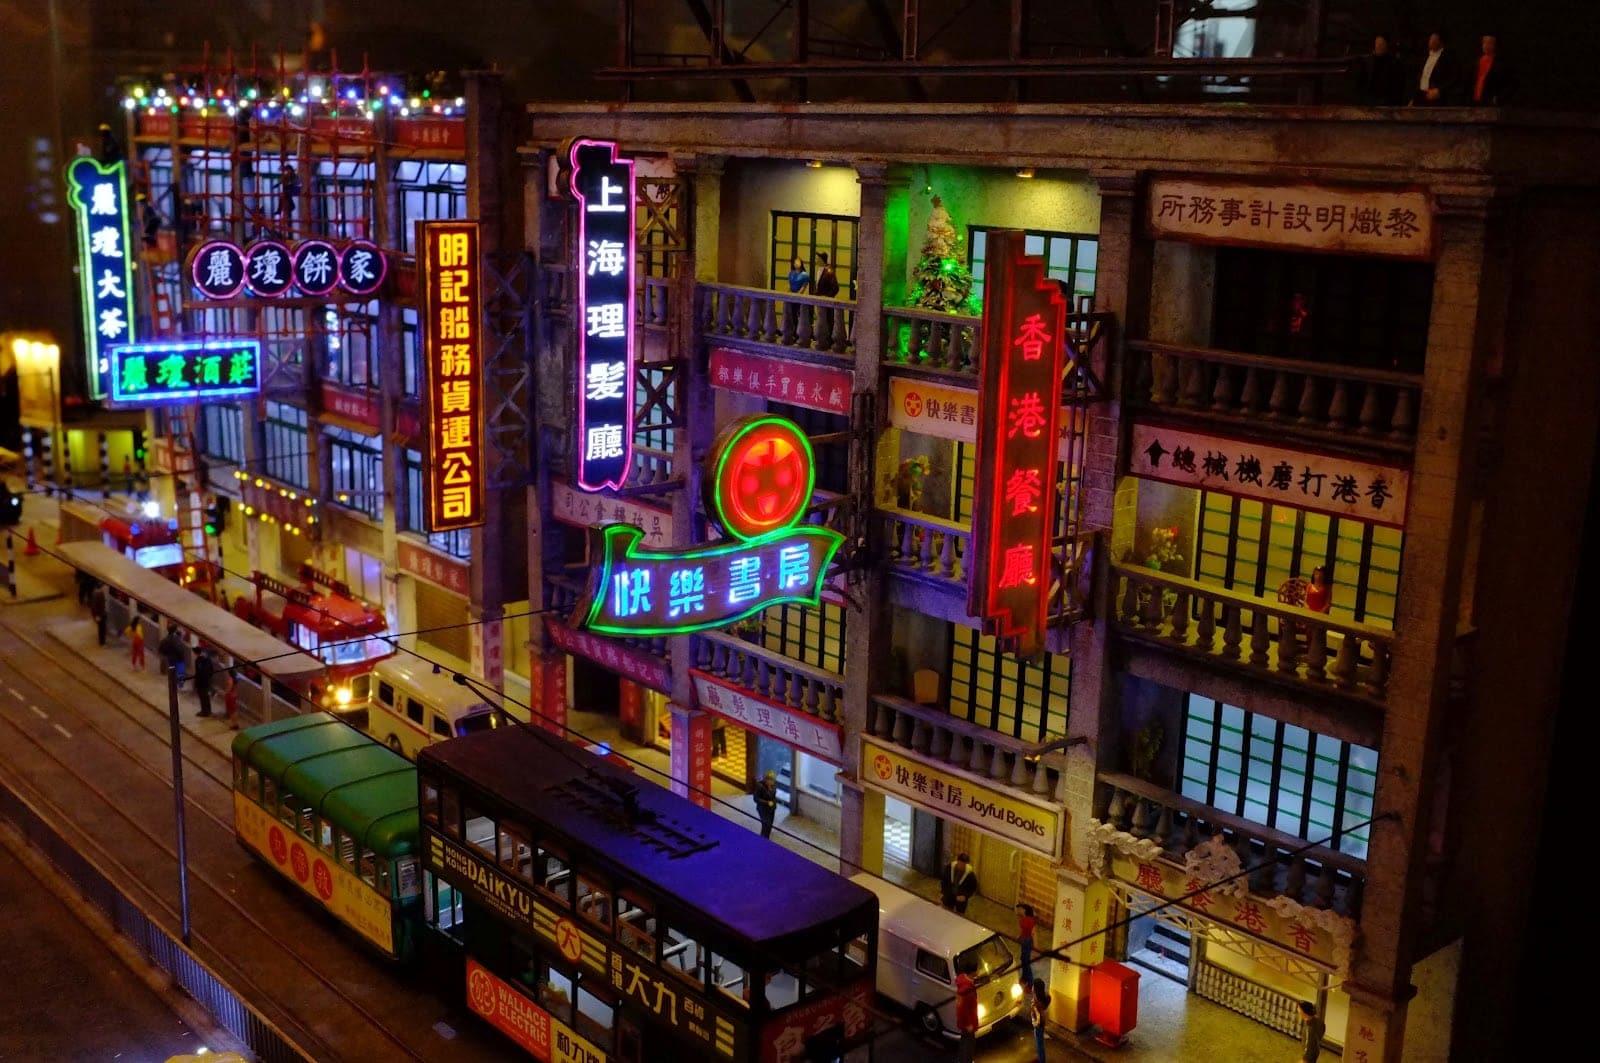 Dingding, Hong Kong Tramways, Double Decker, Time Travel in Hong Kong